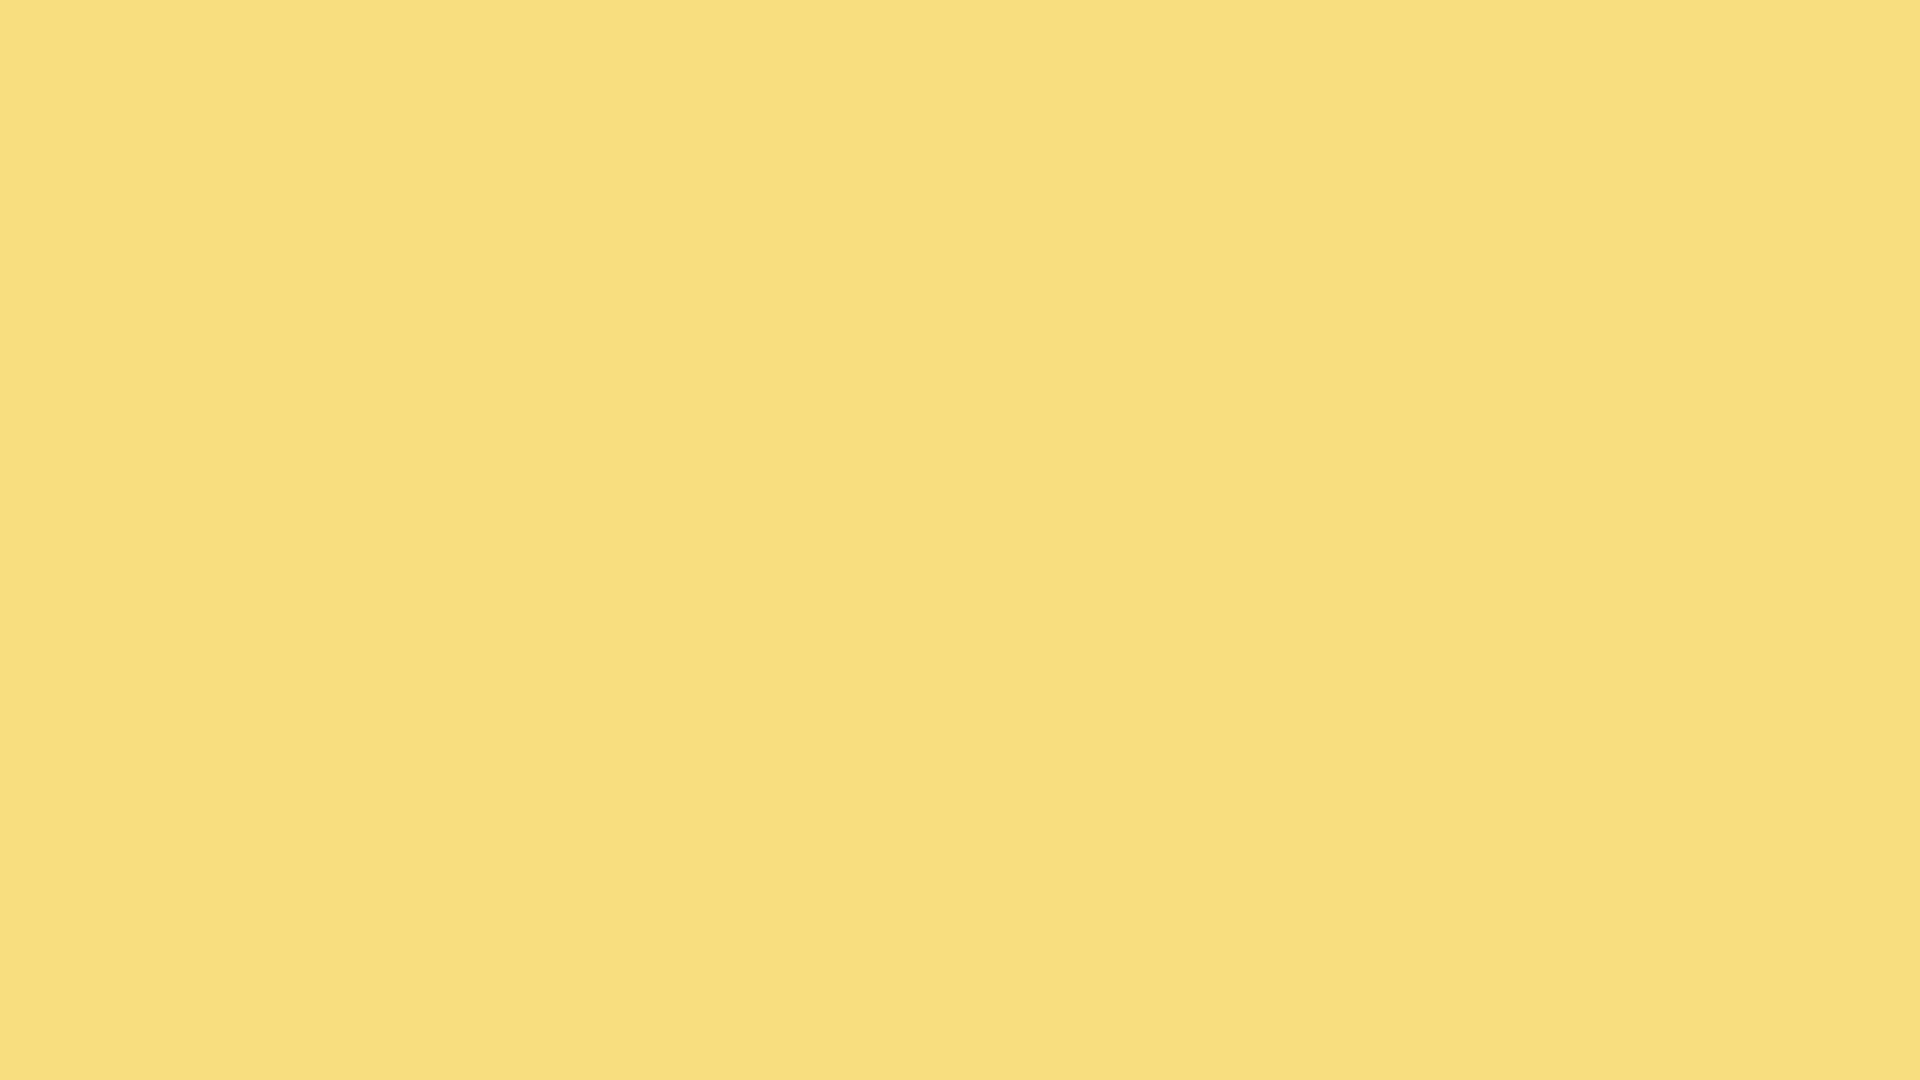 1920x1080 Jasmine Solid Color Background